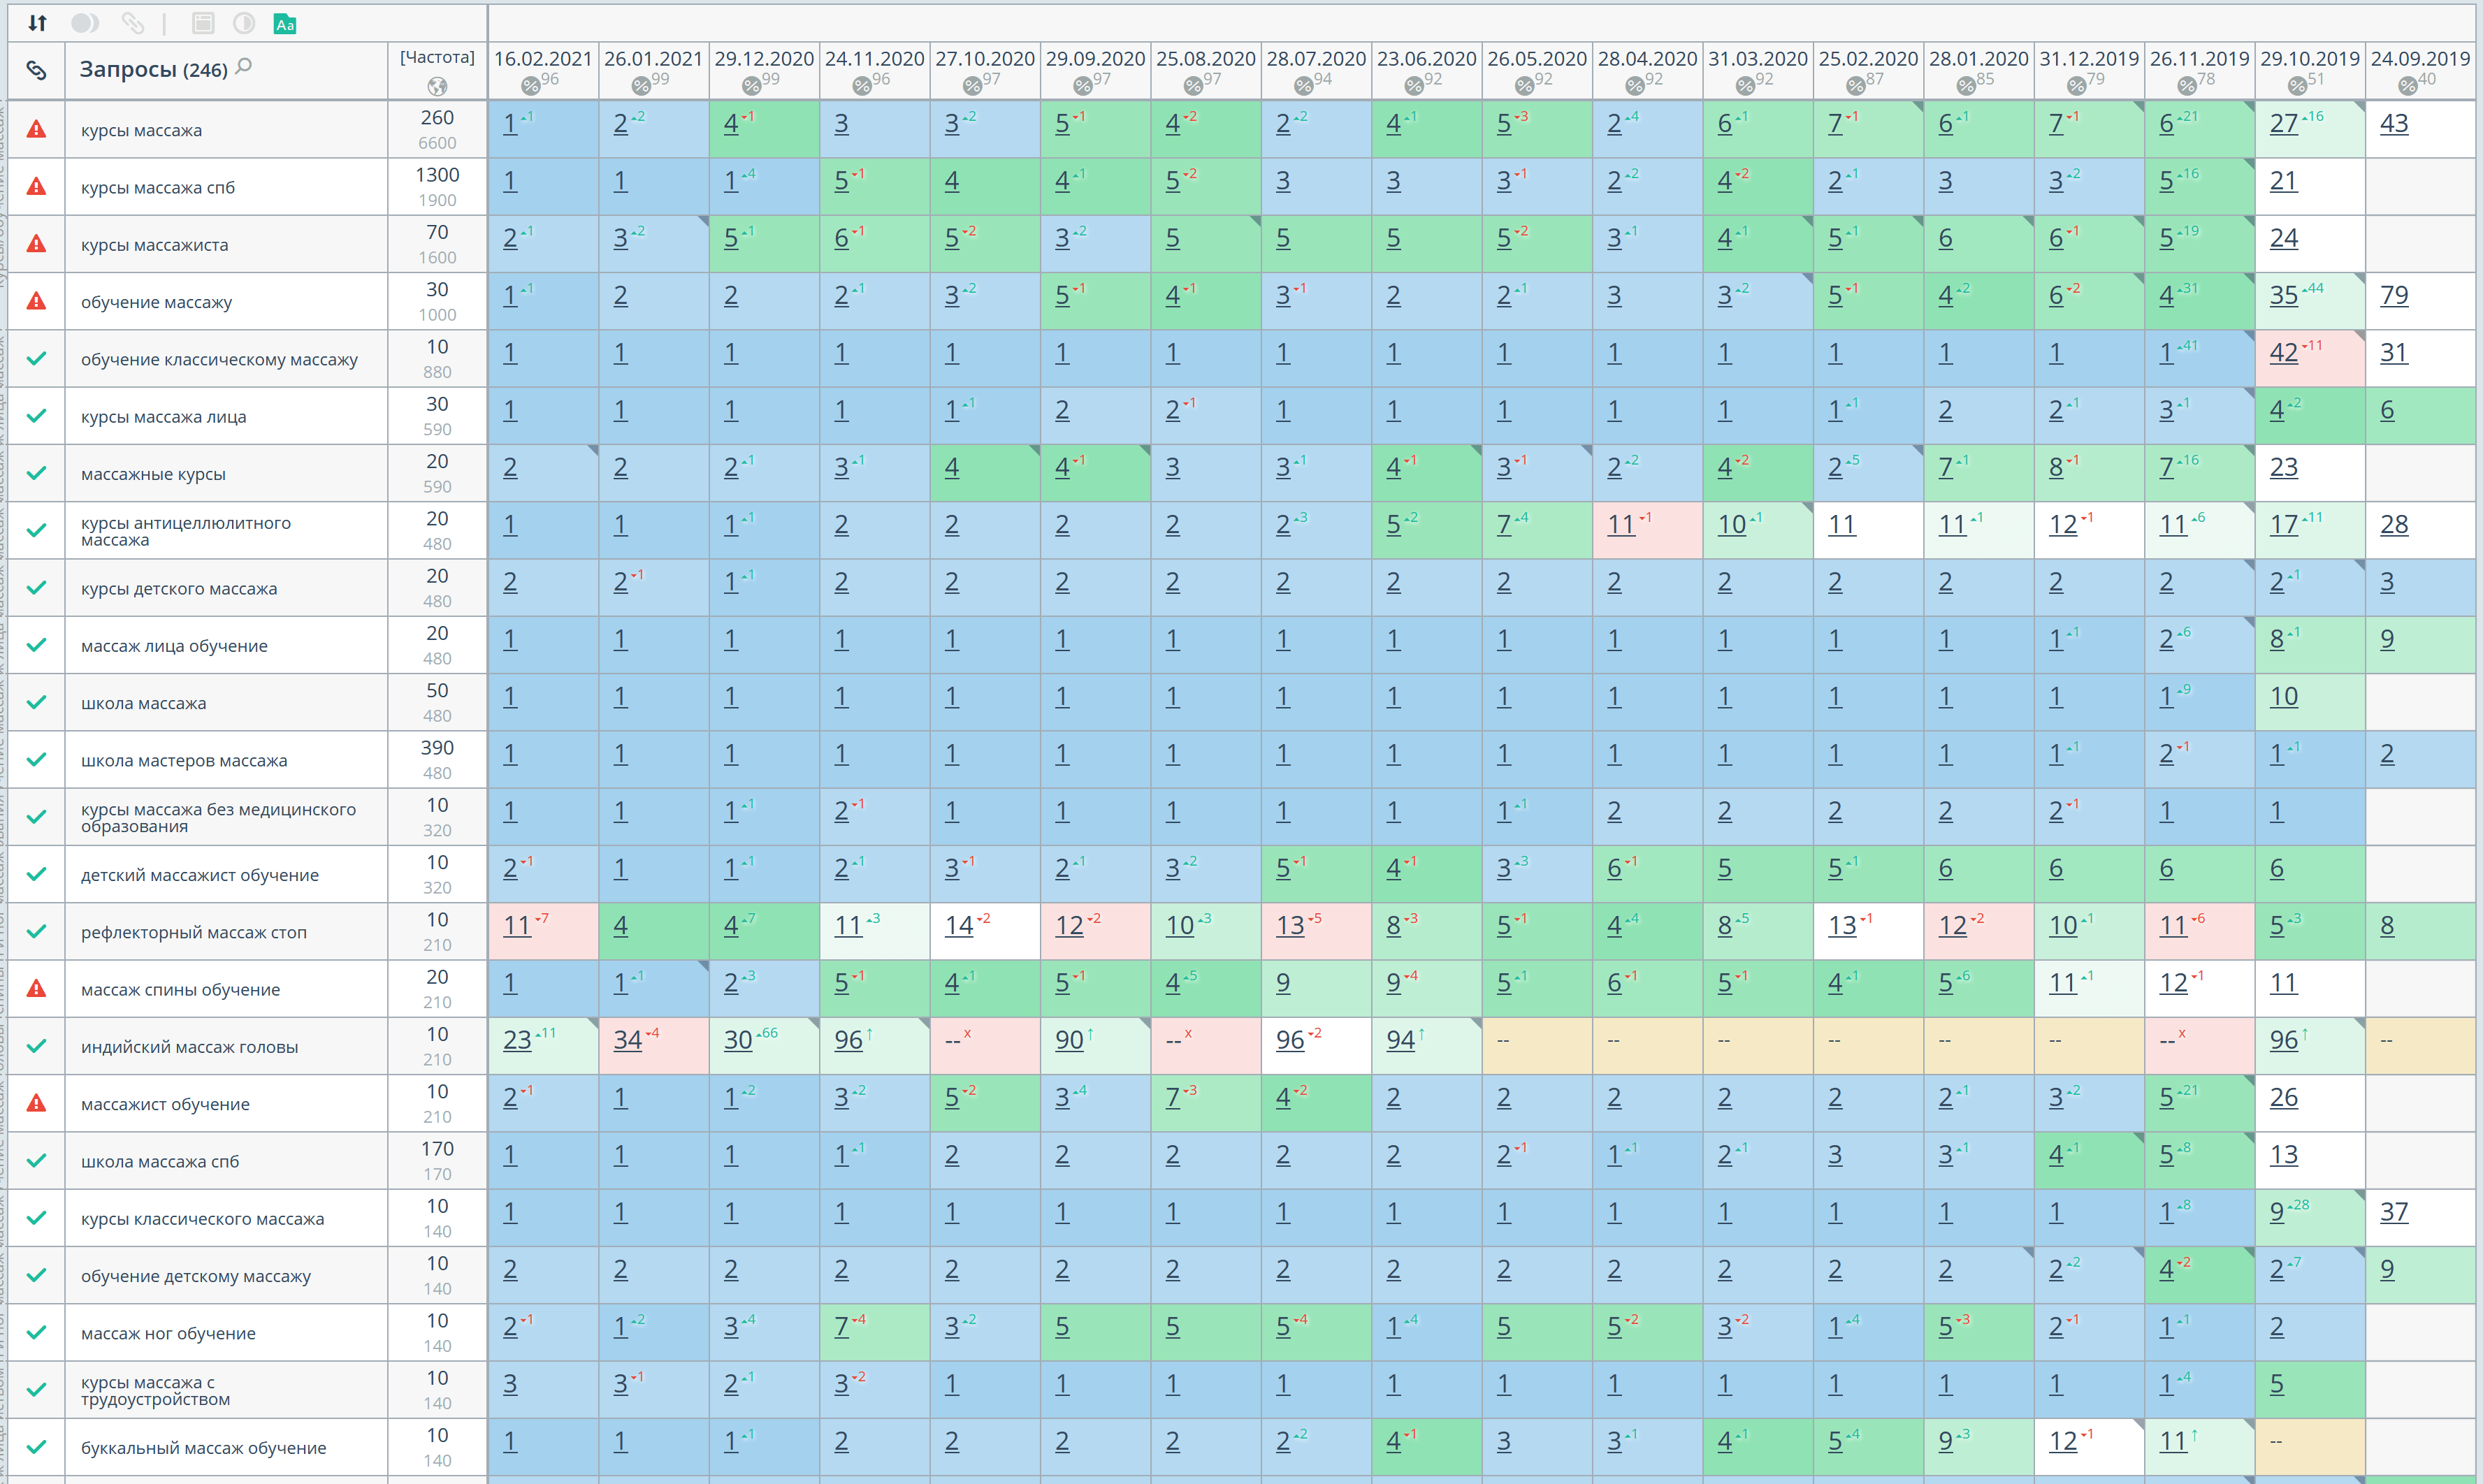 Статистика позиций по Яндексу, регион Санкт-Петербург